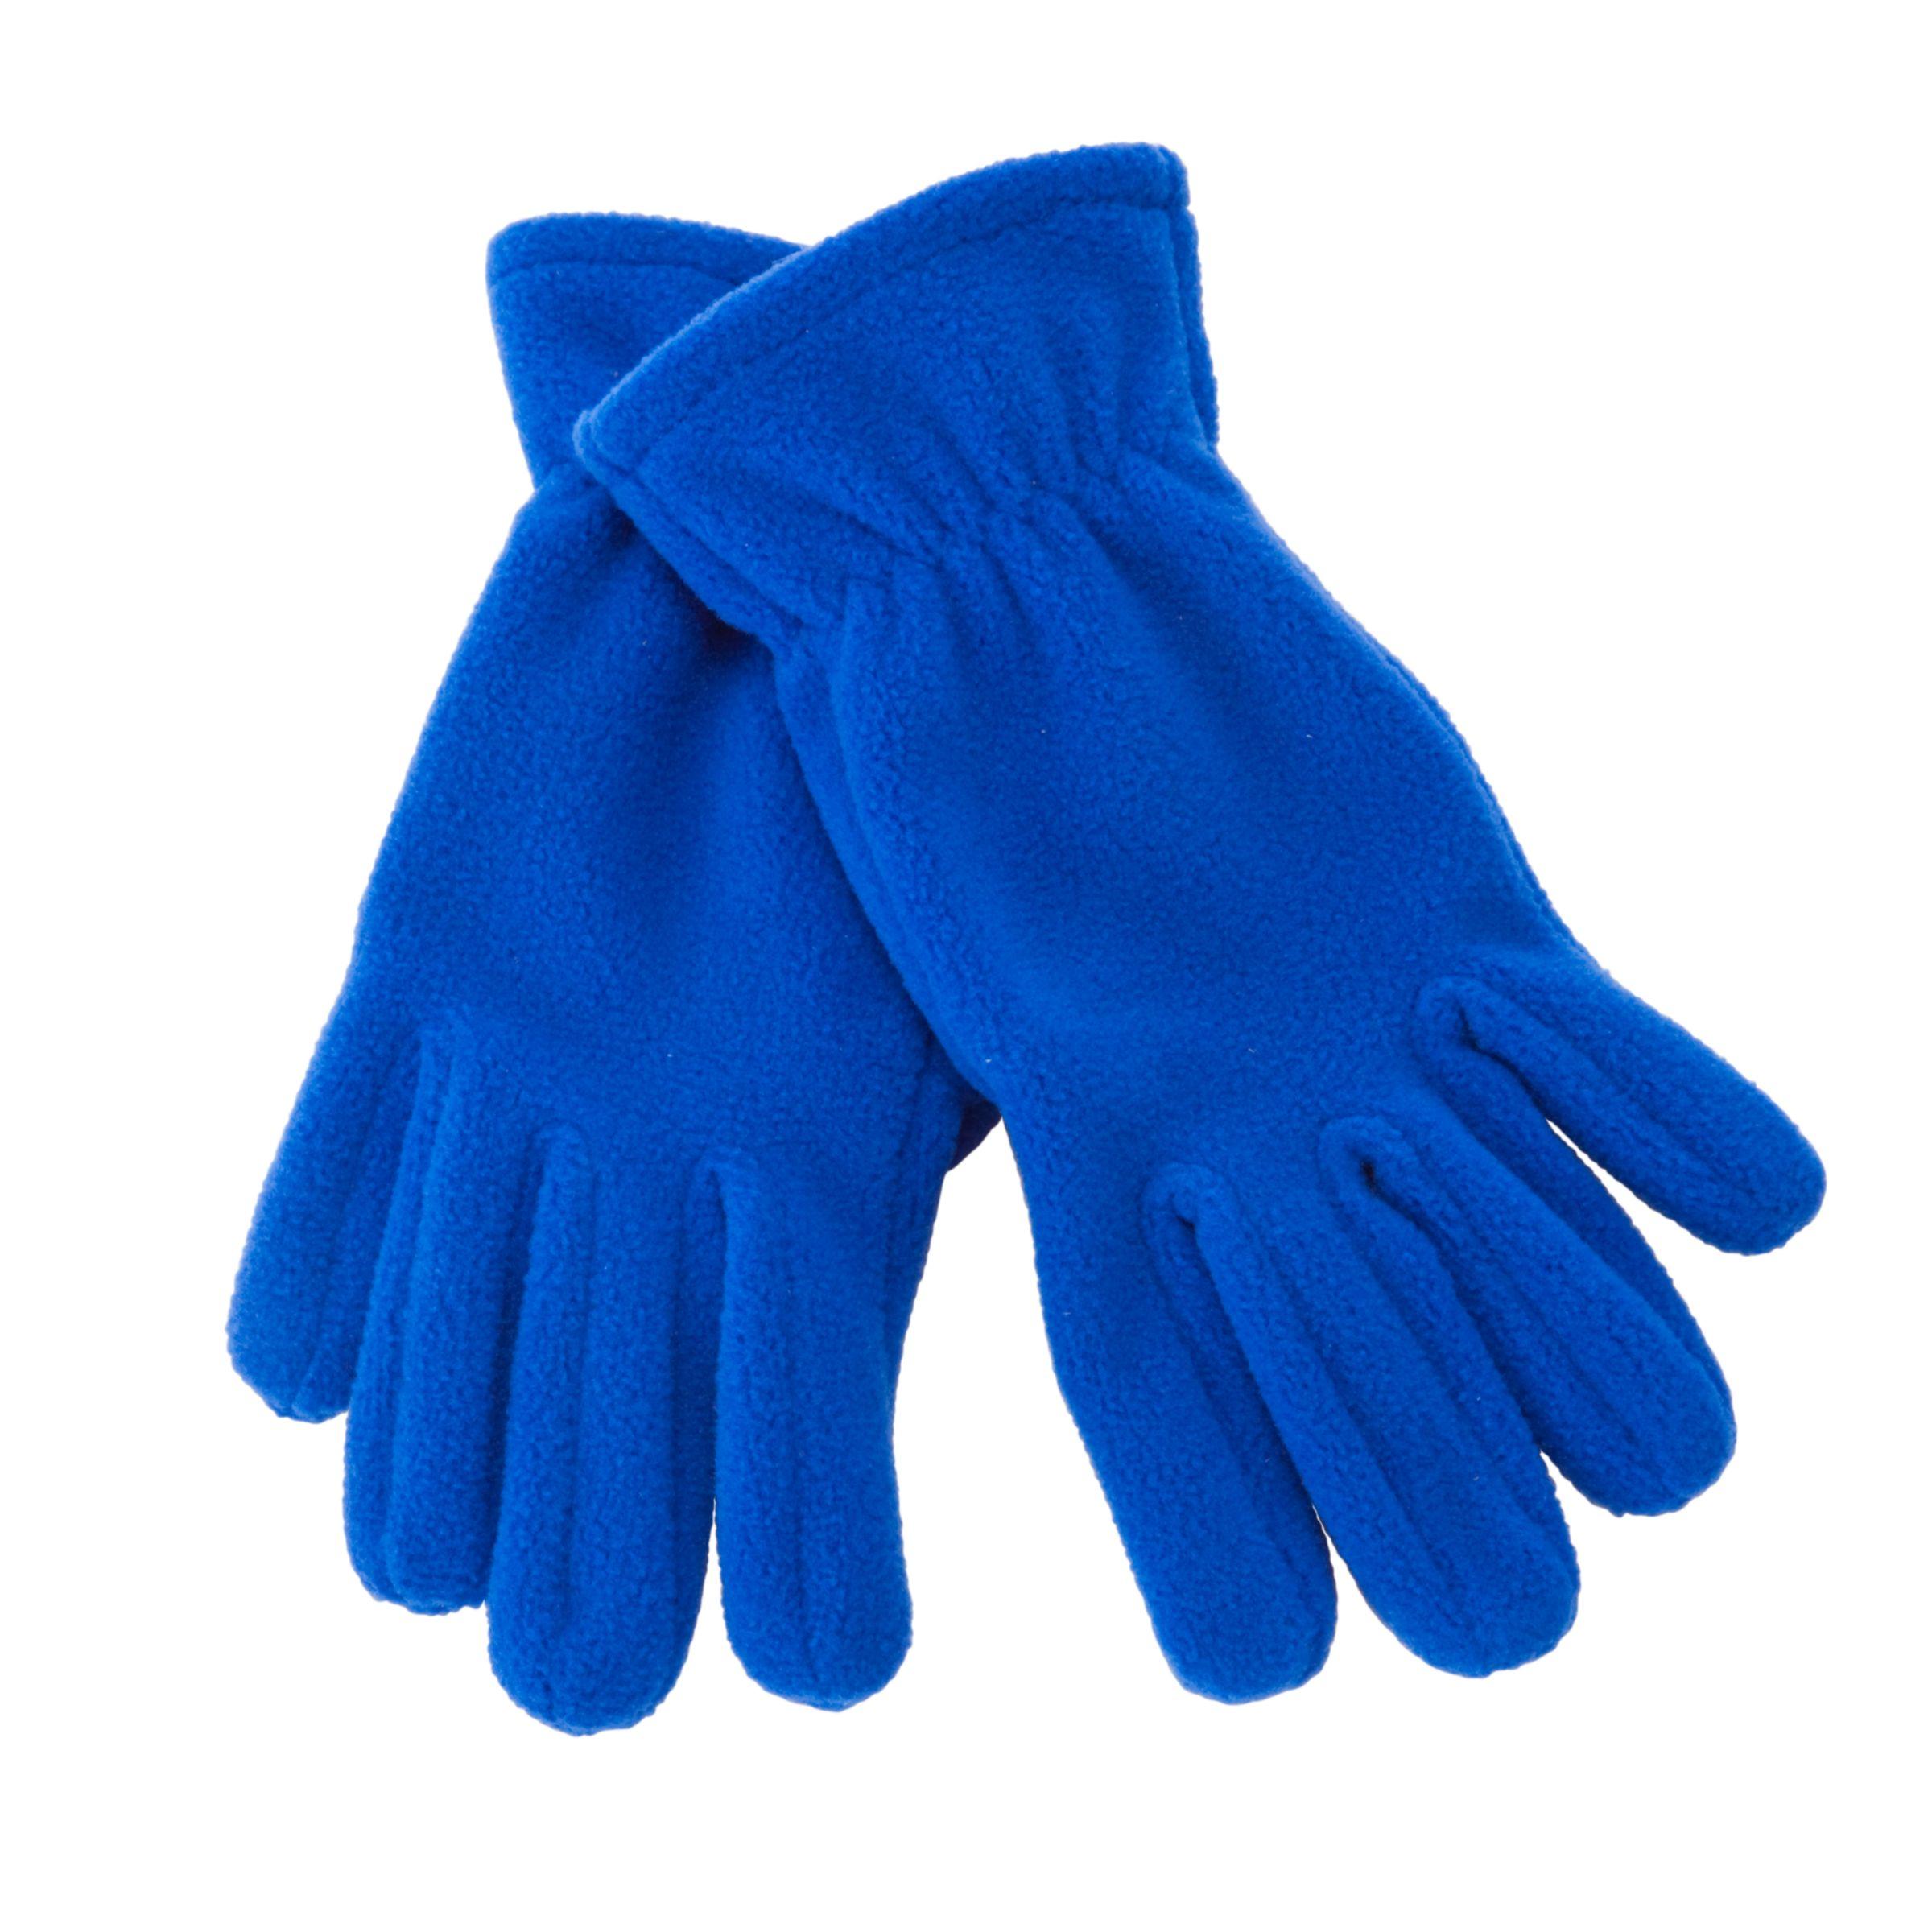 John Lewis Unisex Fleece Gloves, Royal Blue 493144